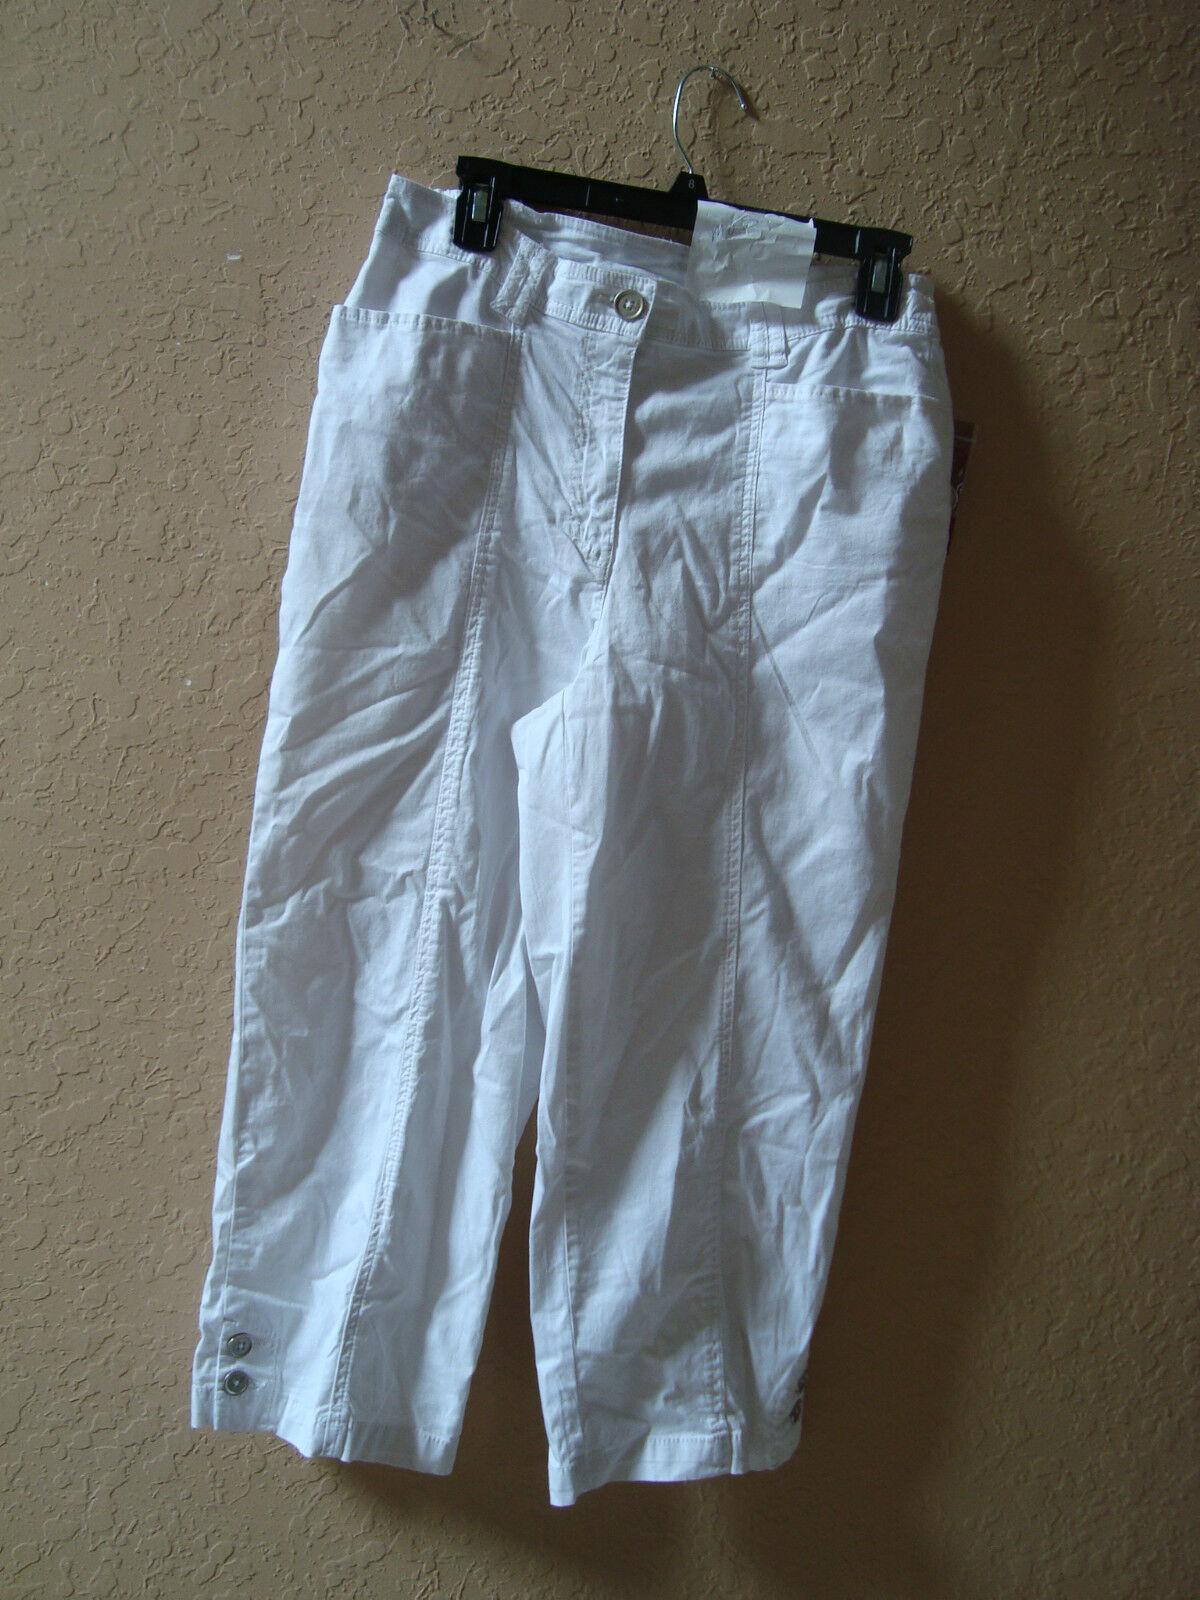 New JM Collection Womens White Capri Pants 8